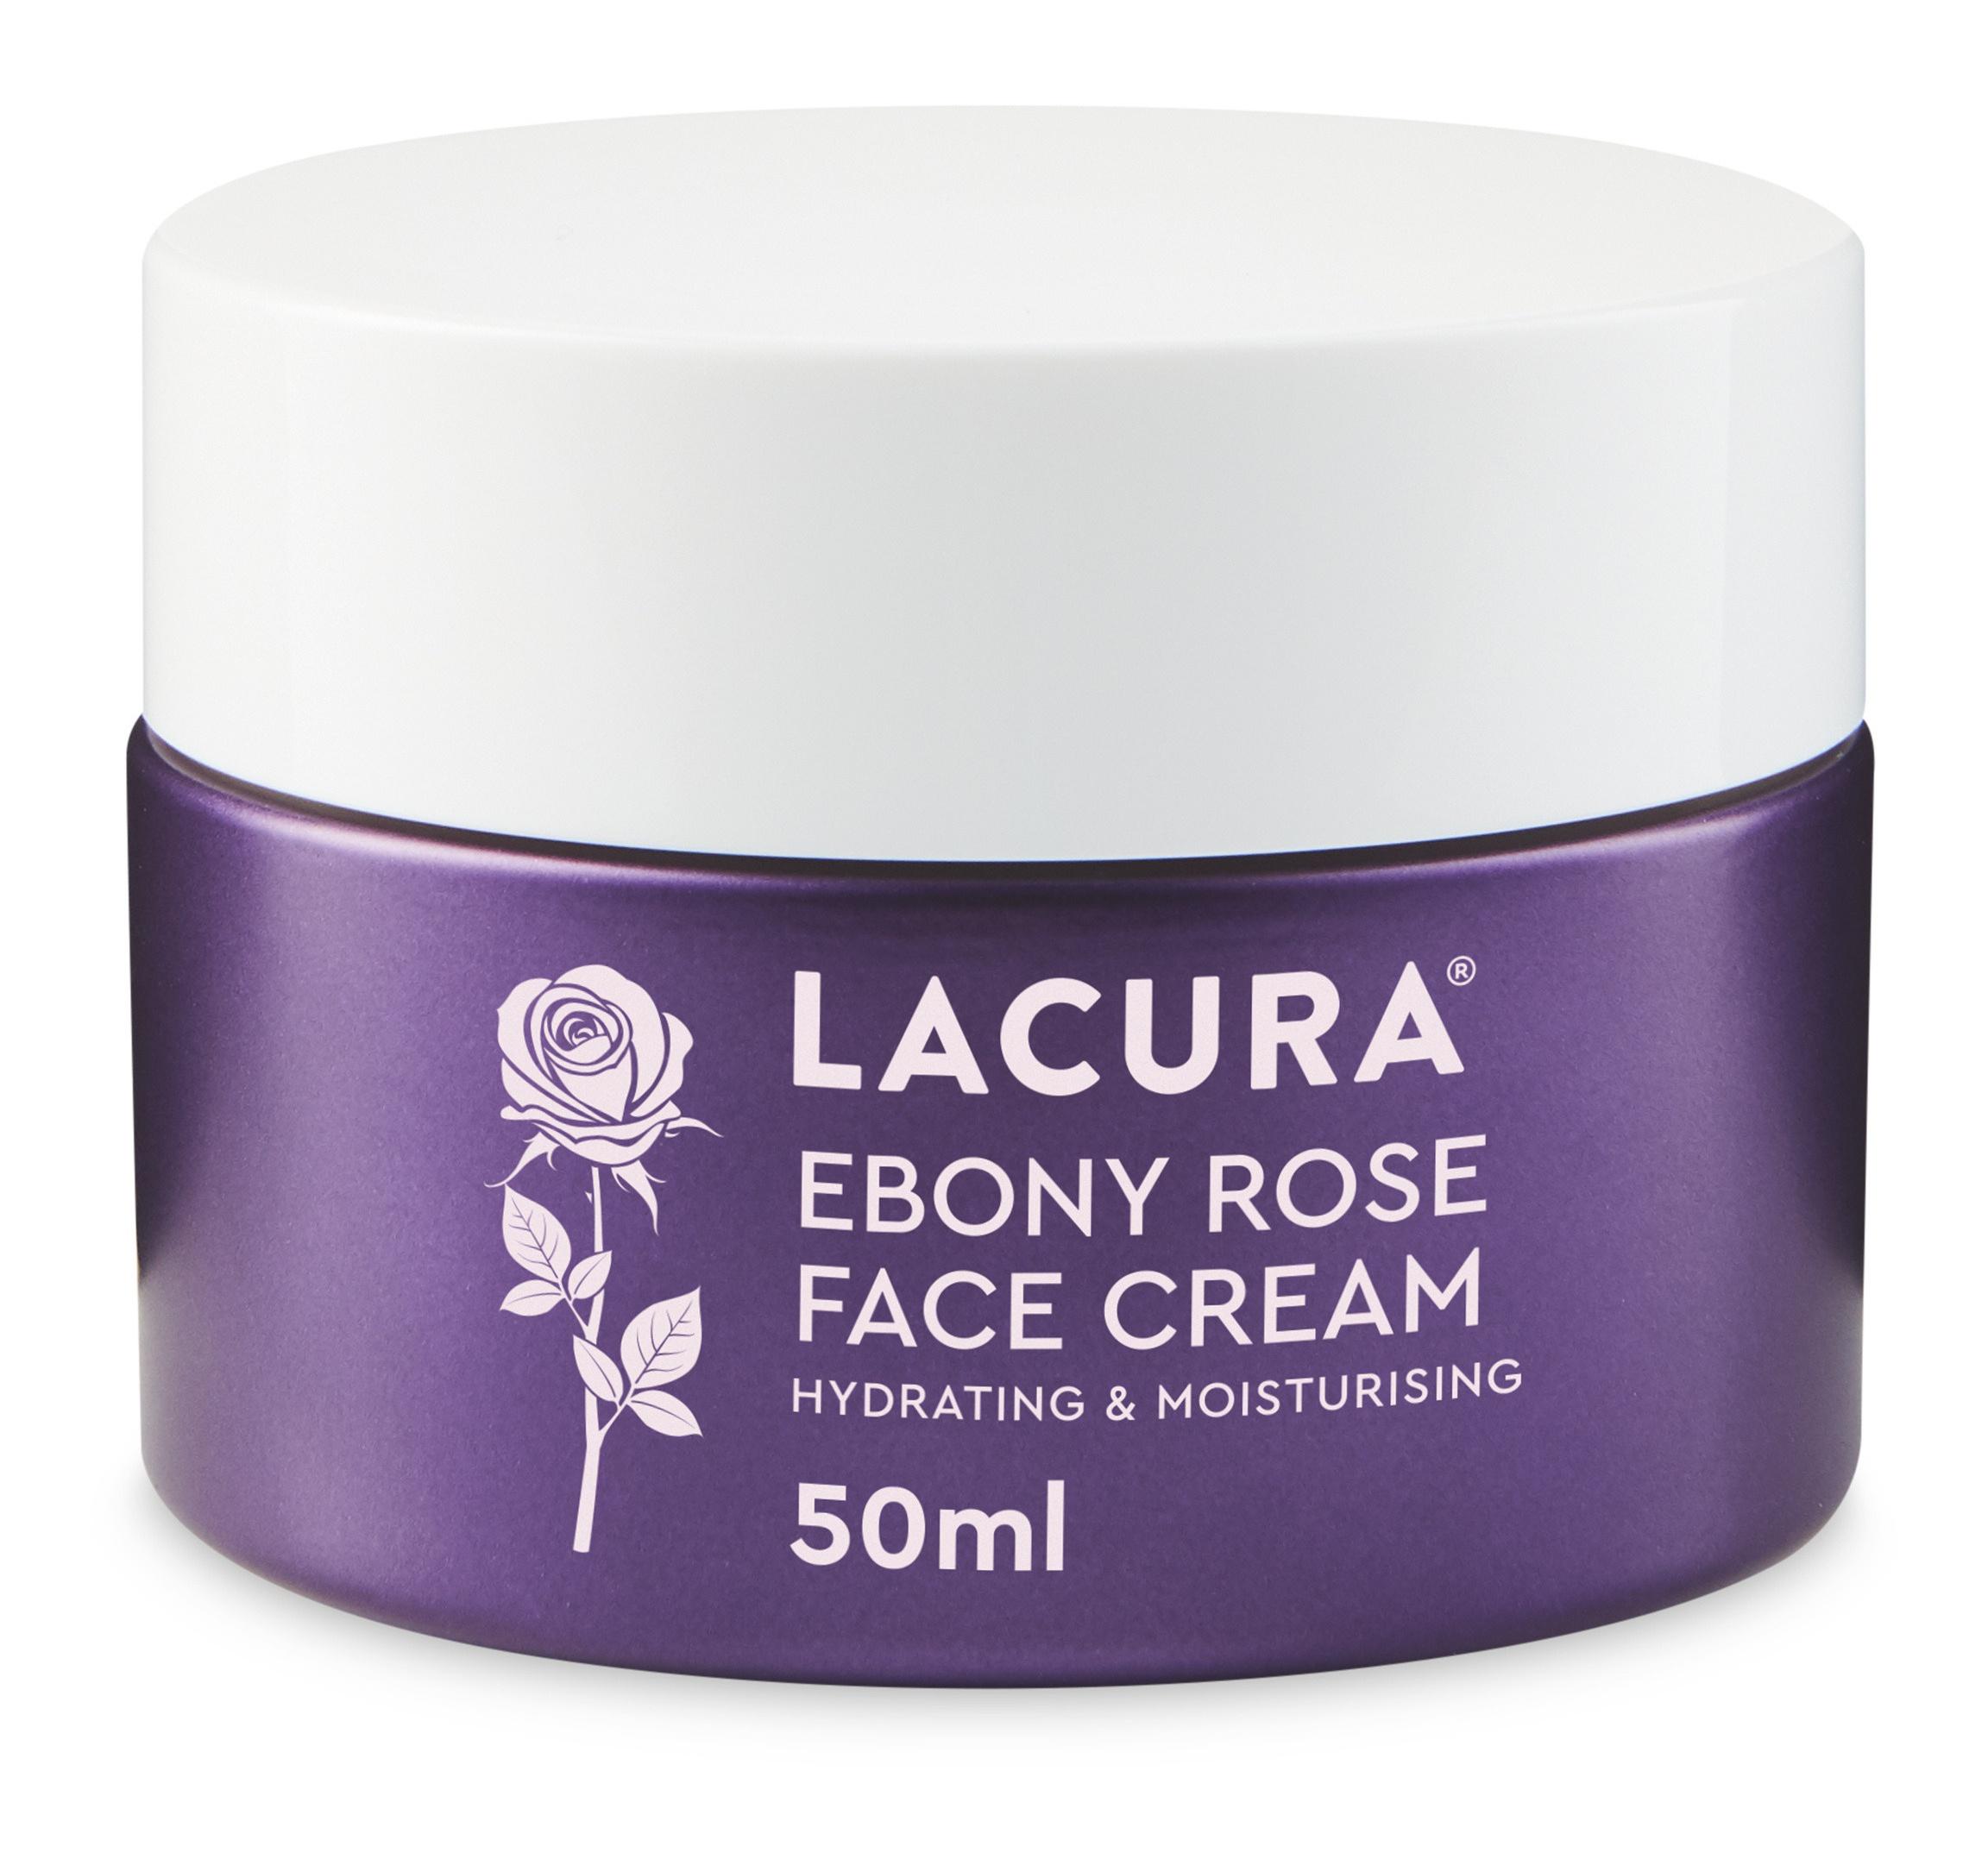 LACURA Ebony Rose Face Cream